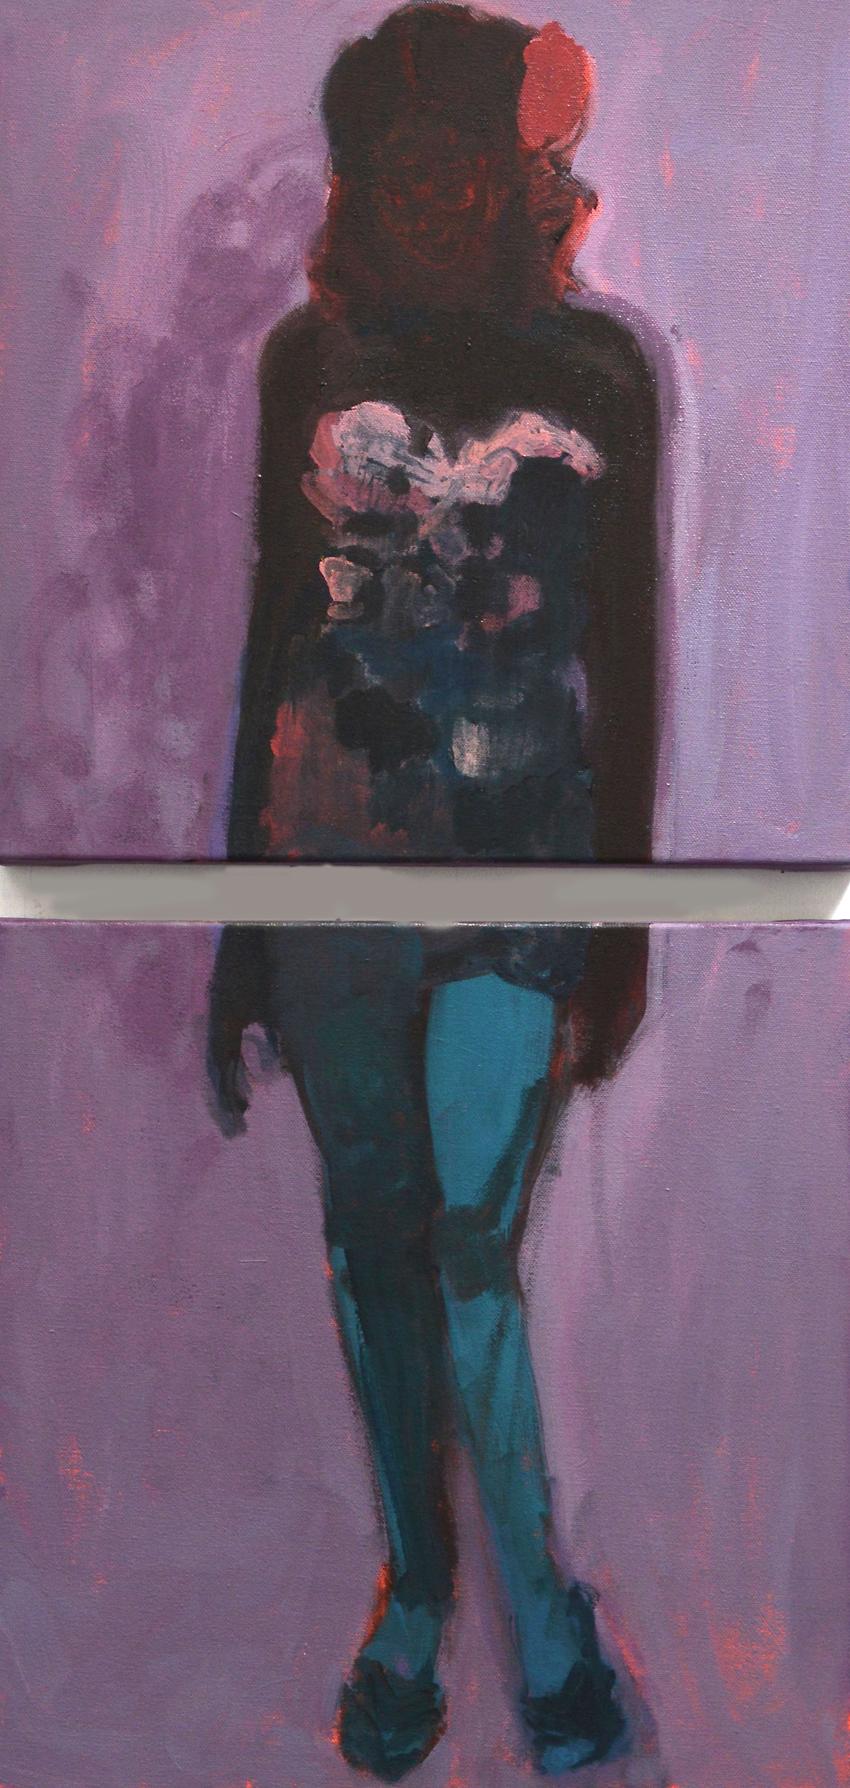 Artist: Rachel Glittenberg  Title: The World of Edie  Size: 40 x 40 cm  Medium: Oil on canvas  Price: £1600